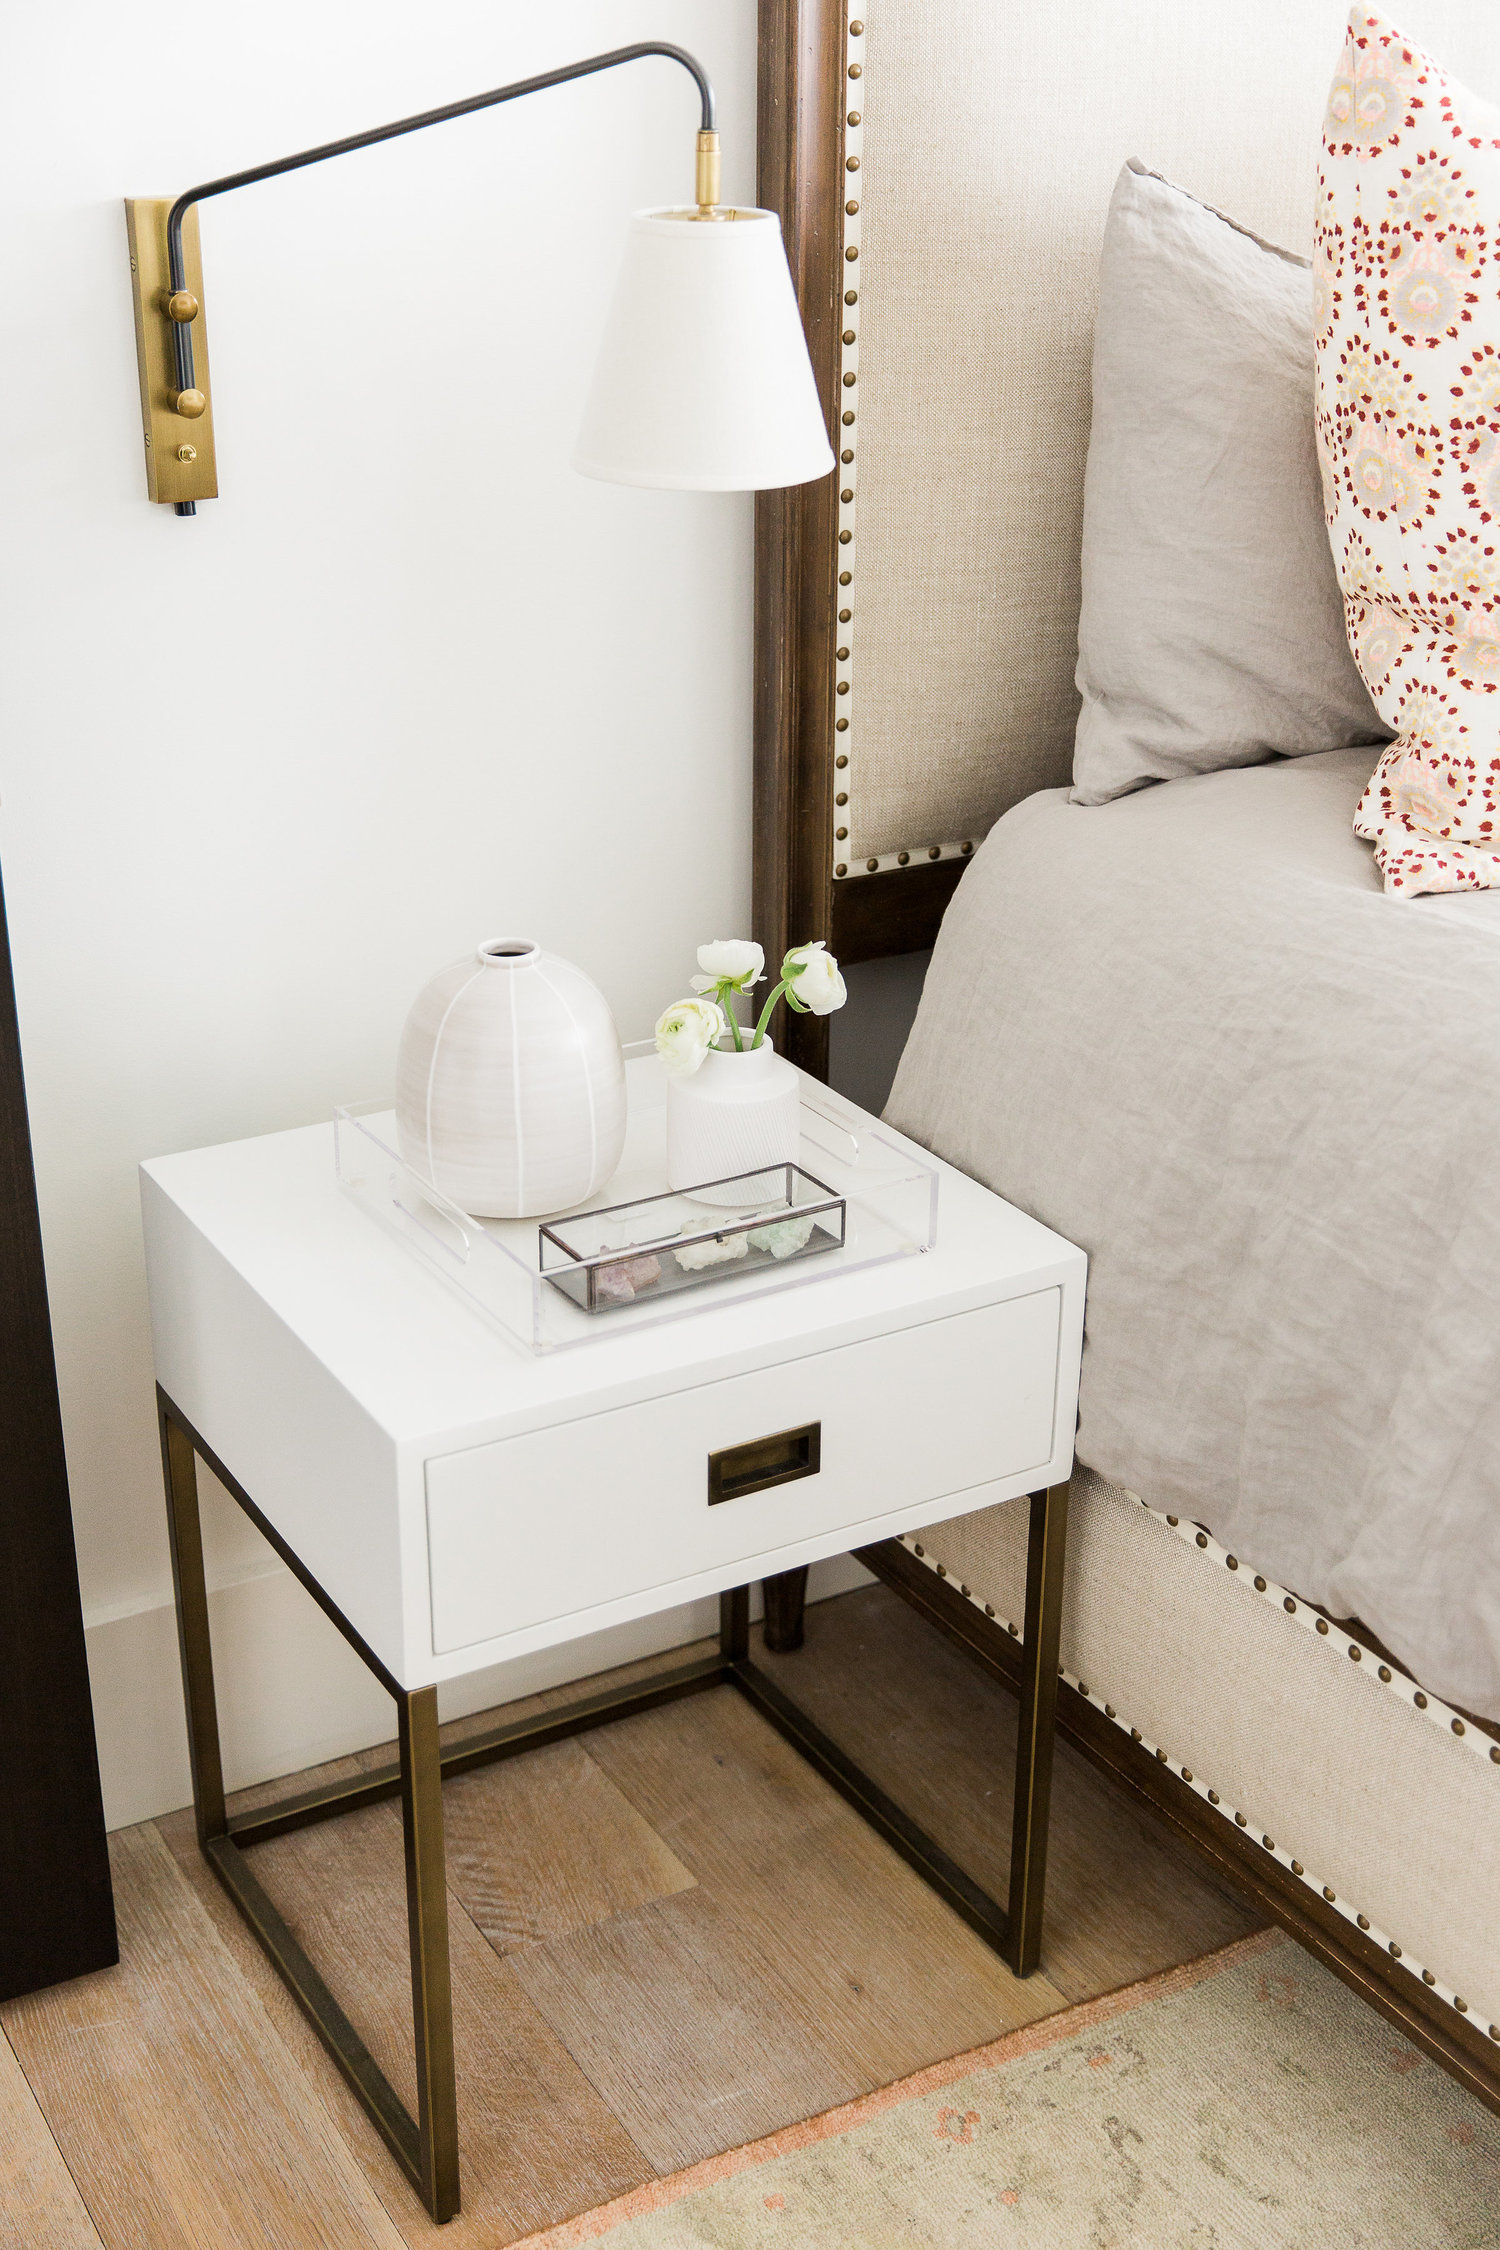 Minimalist white nightstand next to bed